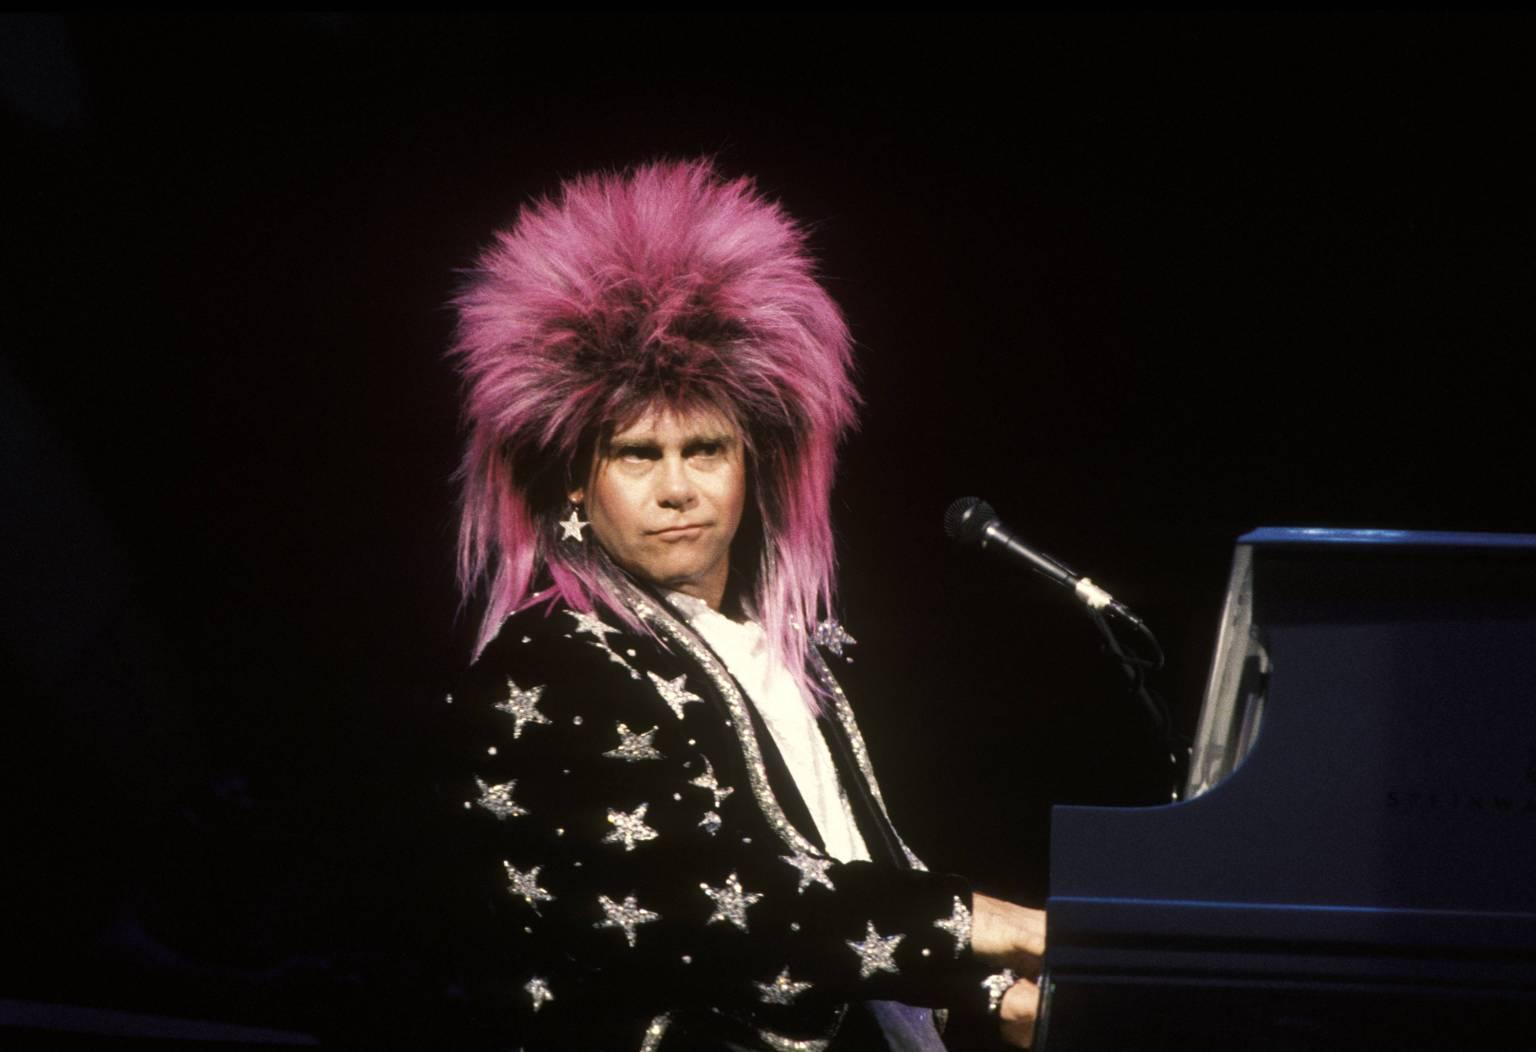 Elton John 70s Costume Elton